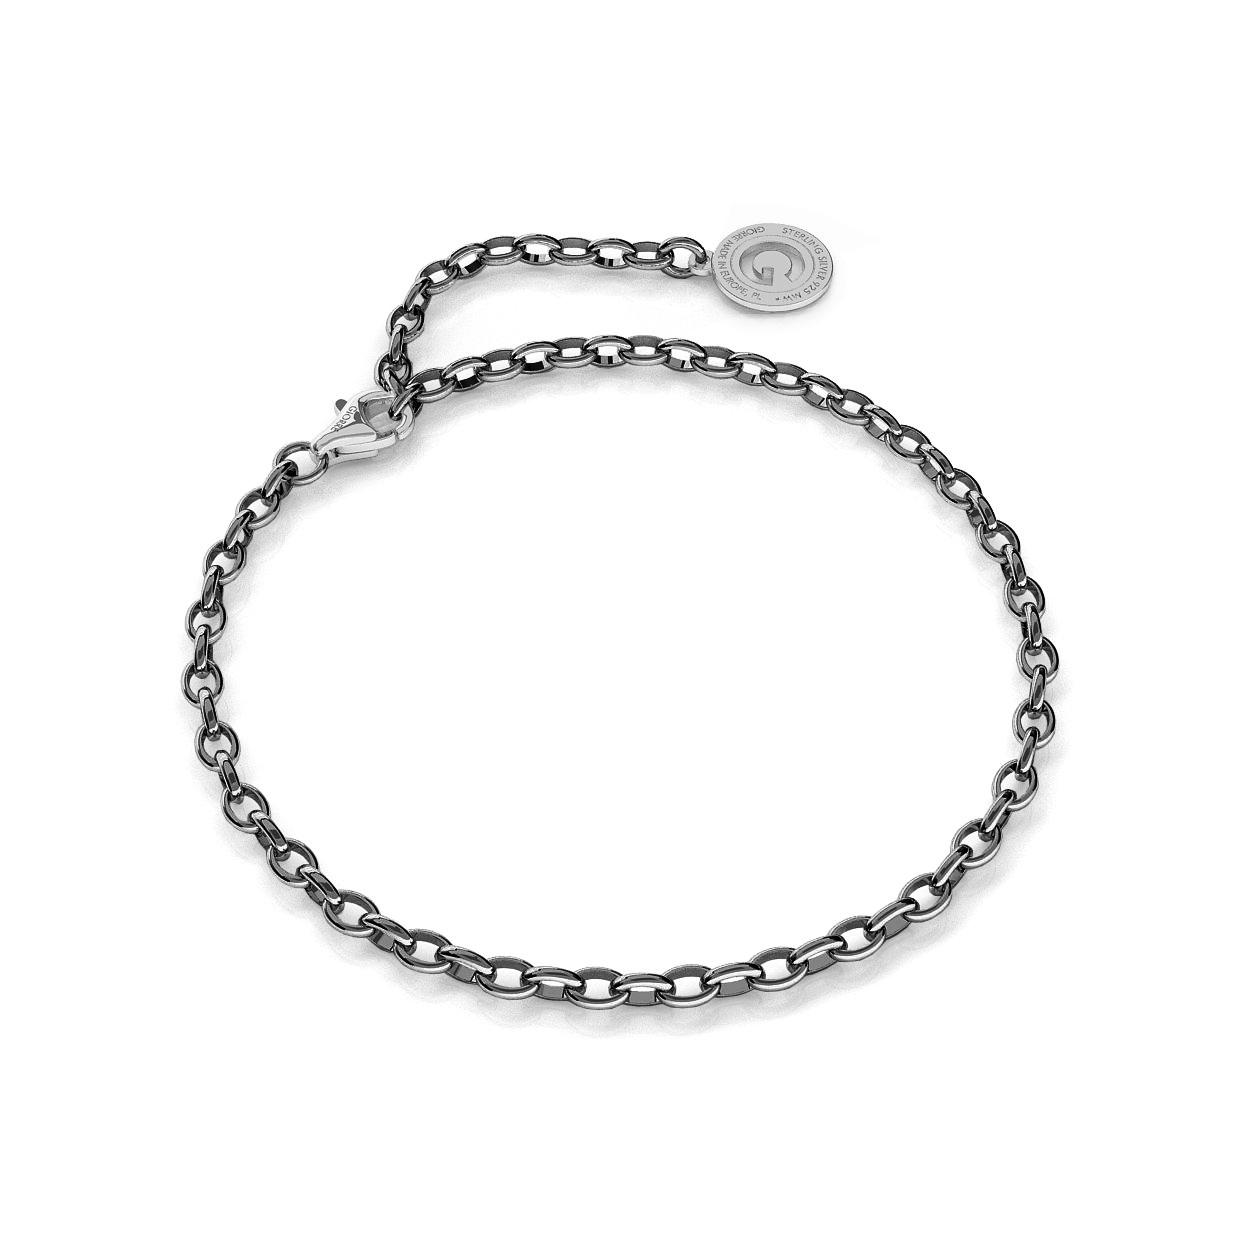 Srebrna bransoletka do charmsów ogniwo 4x3mm 925